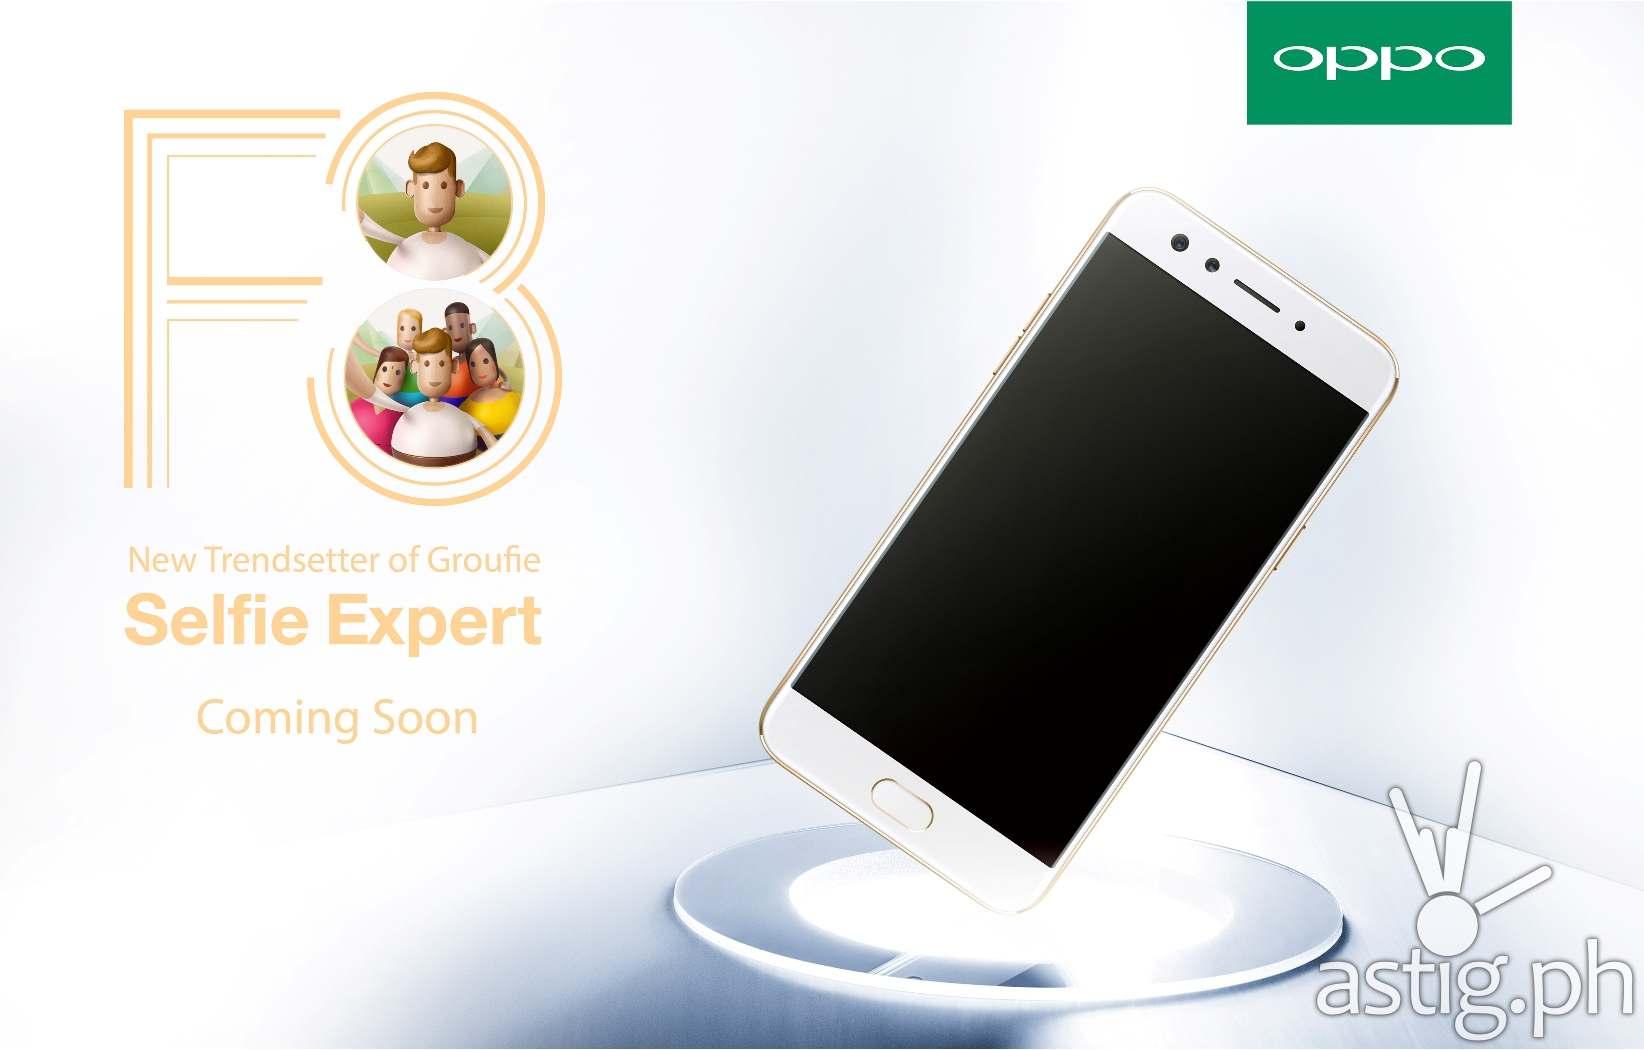 OPPO F3 groufie smartphone